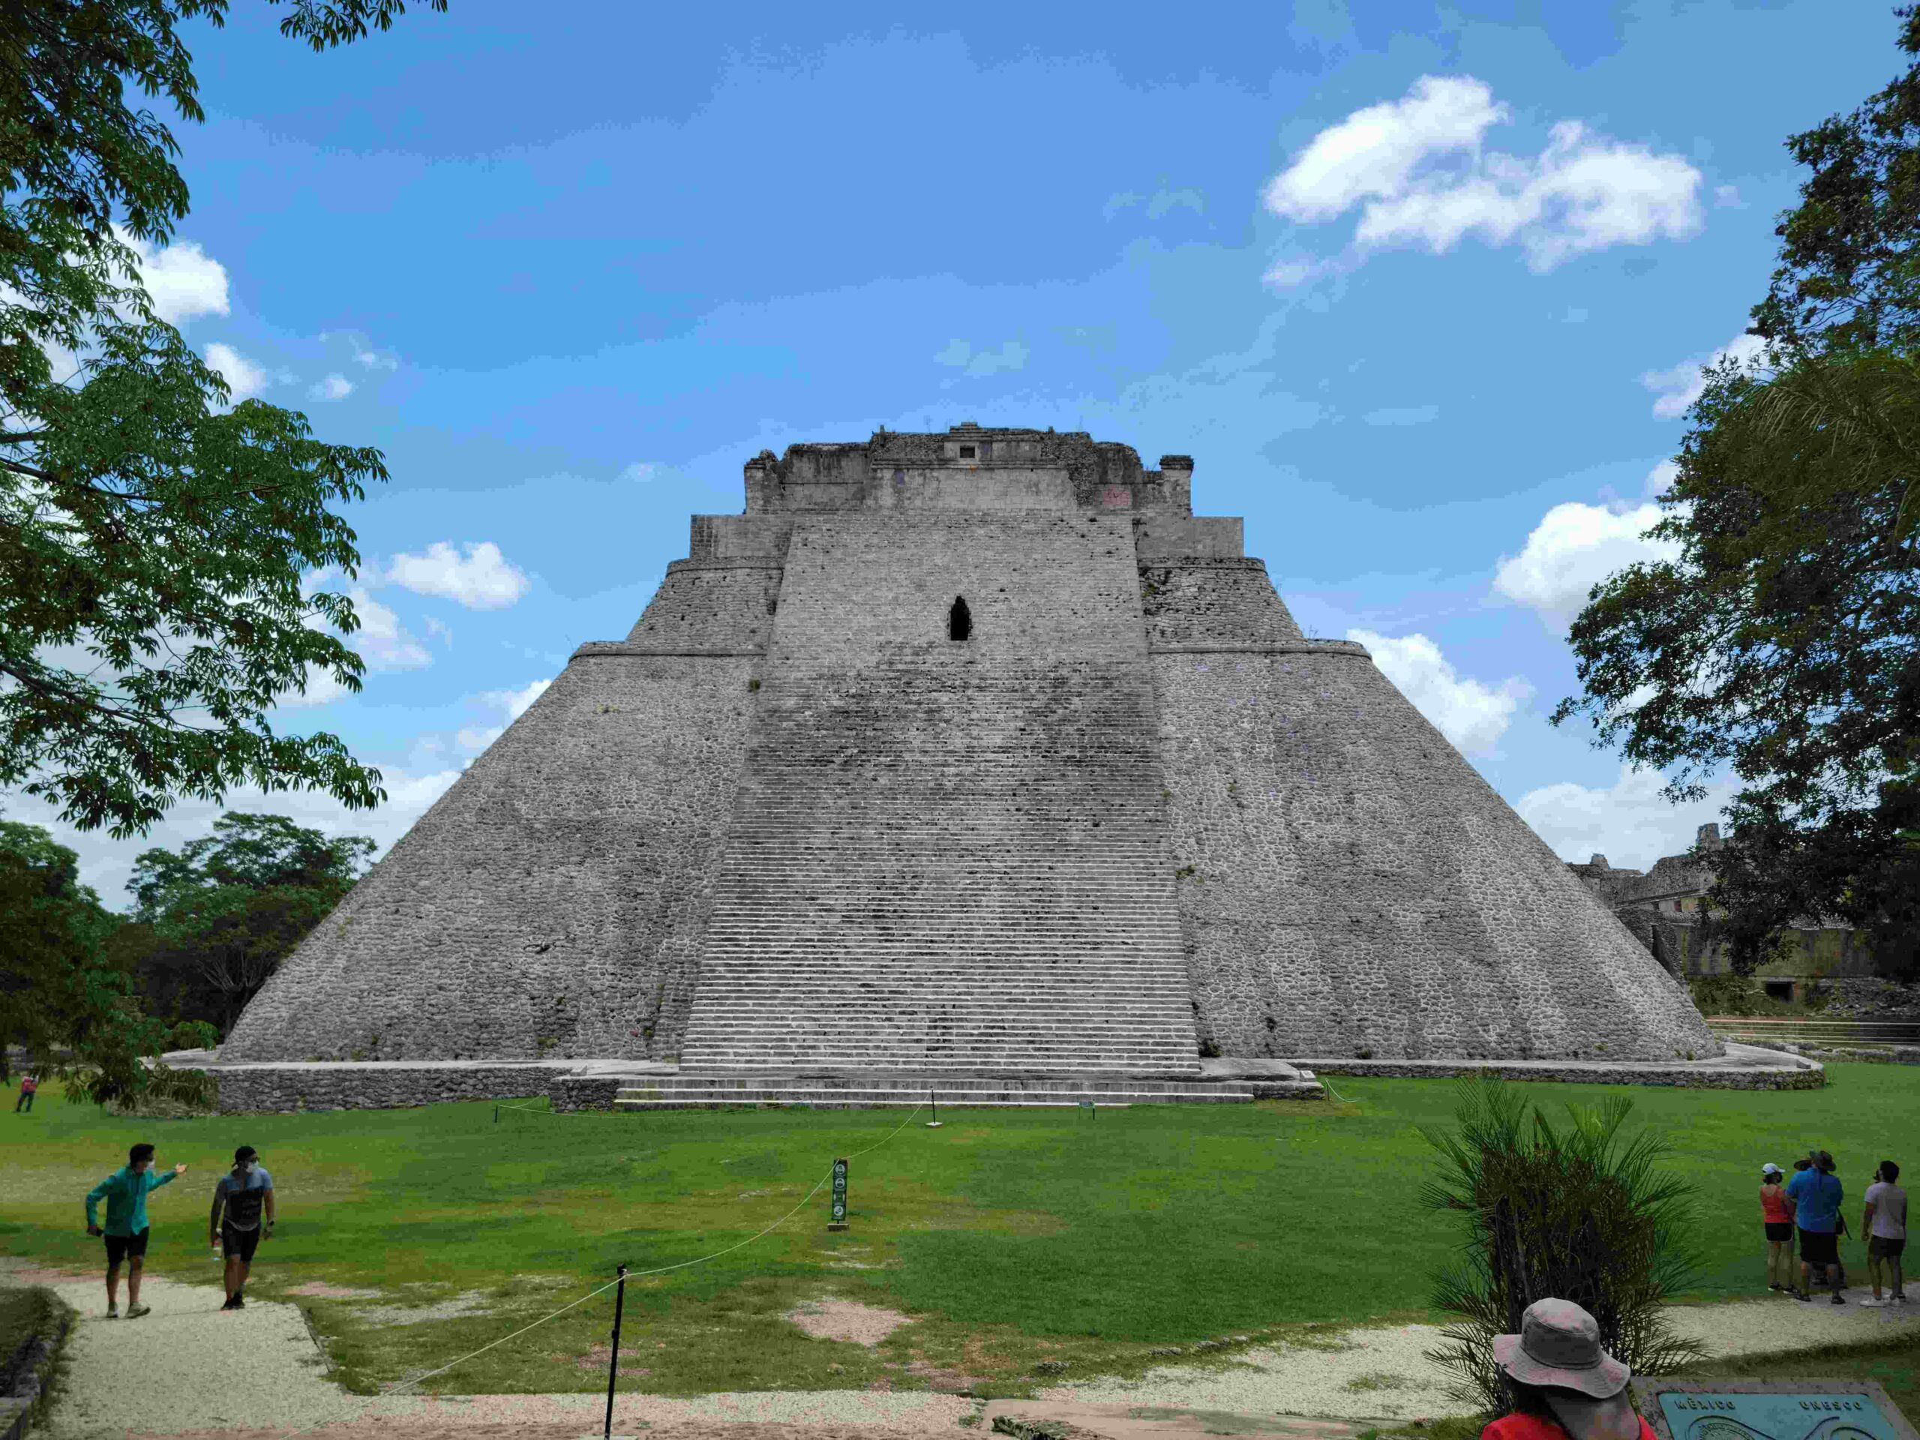 pyramid opening